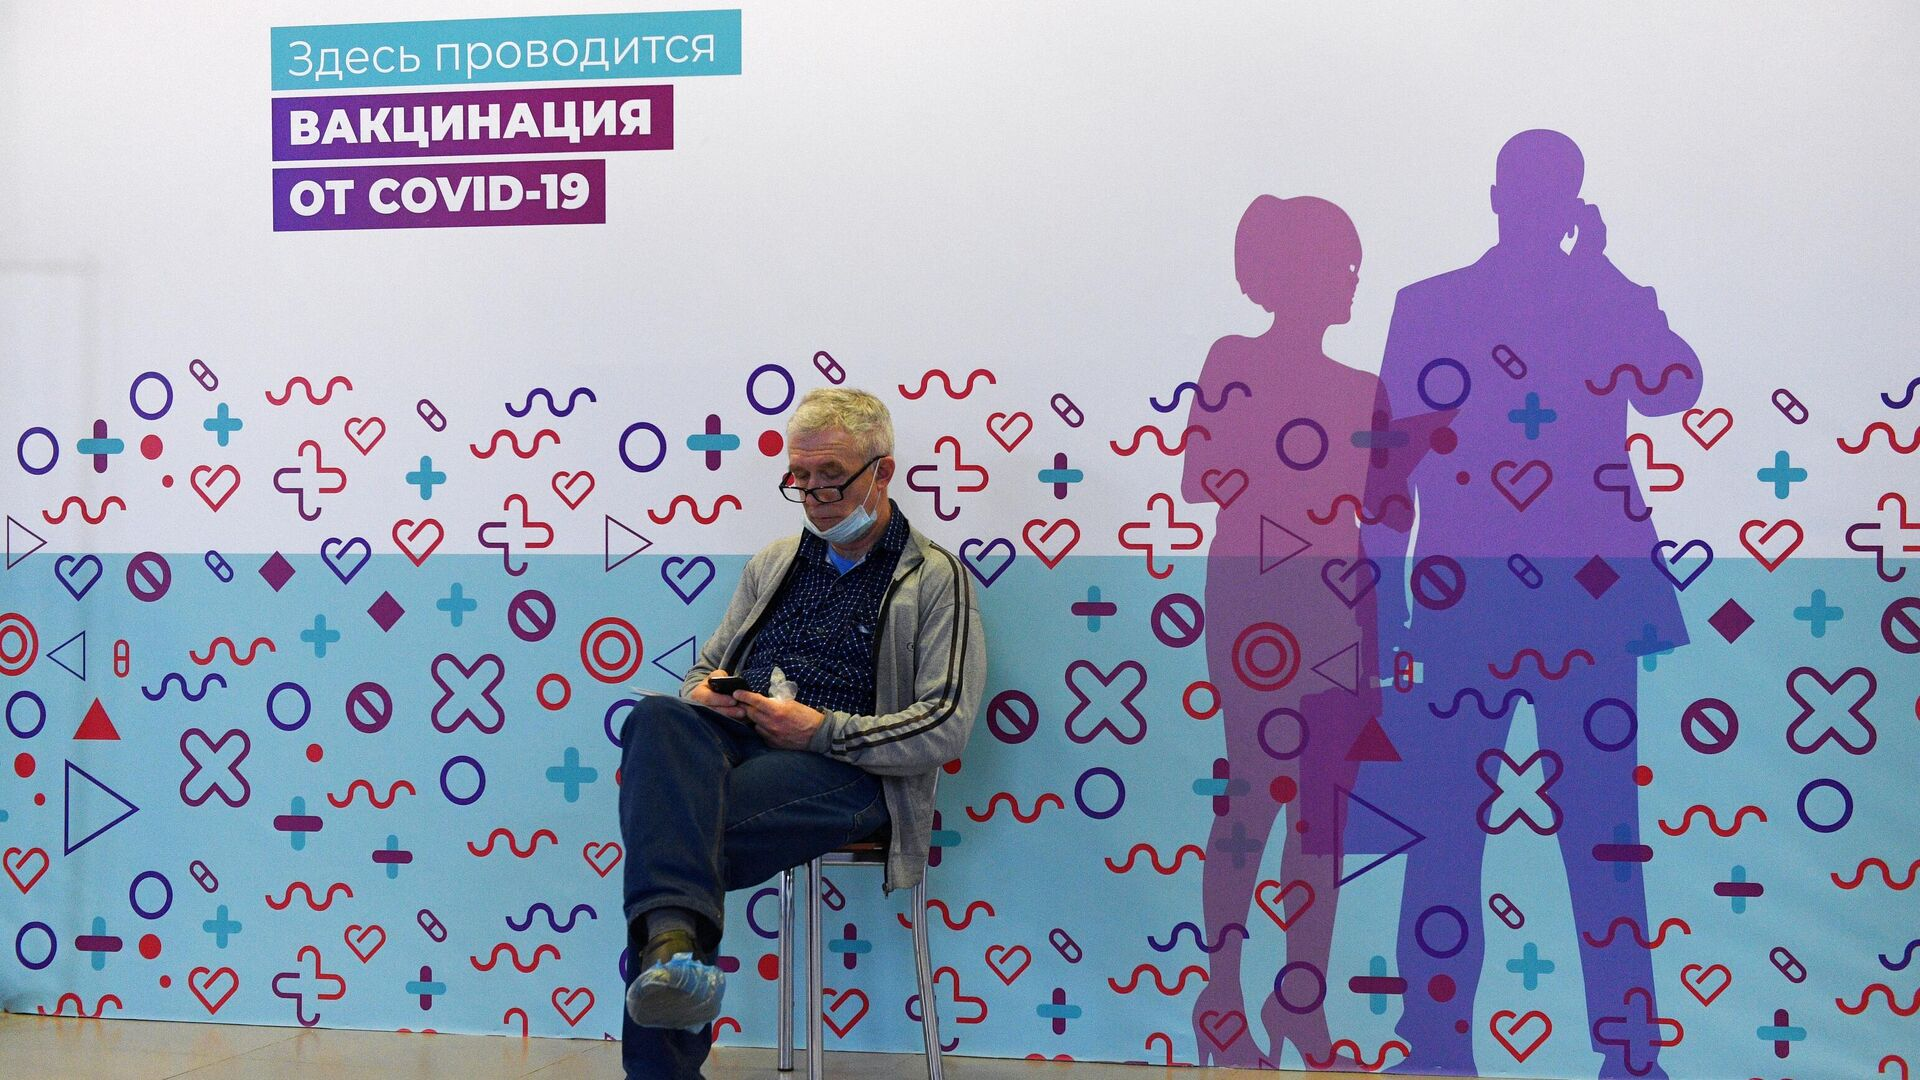 Мужчина ожидает своей очереди в мобильный пункт вакцинации от COVID-19 - РИА Новости, 1920, 16.06.2021